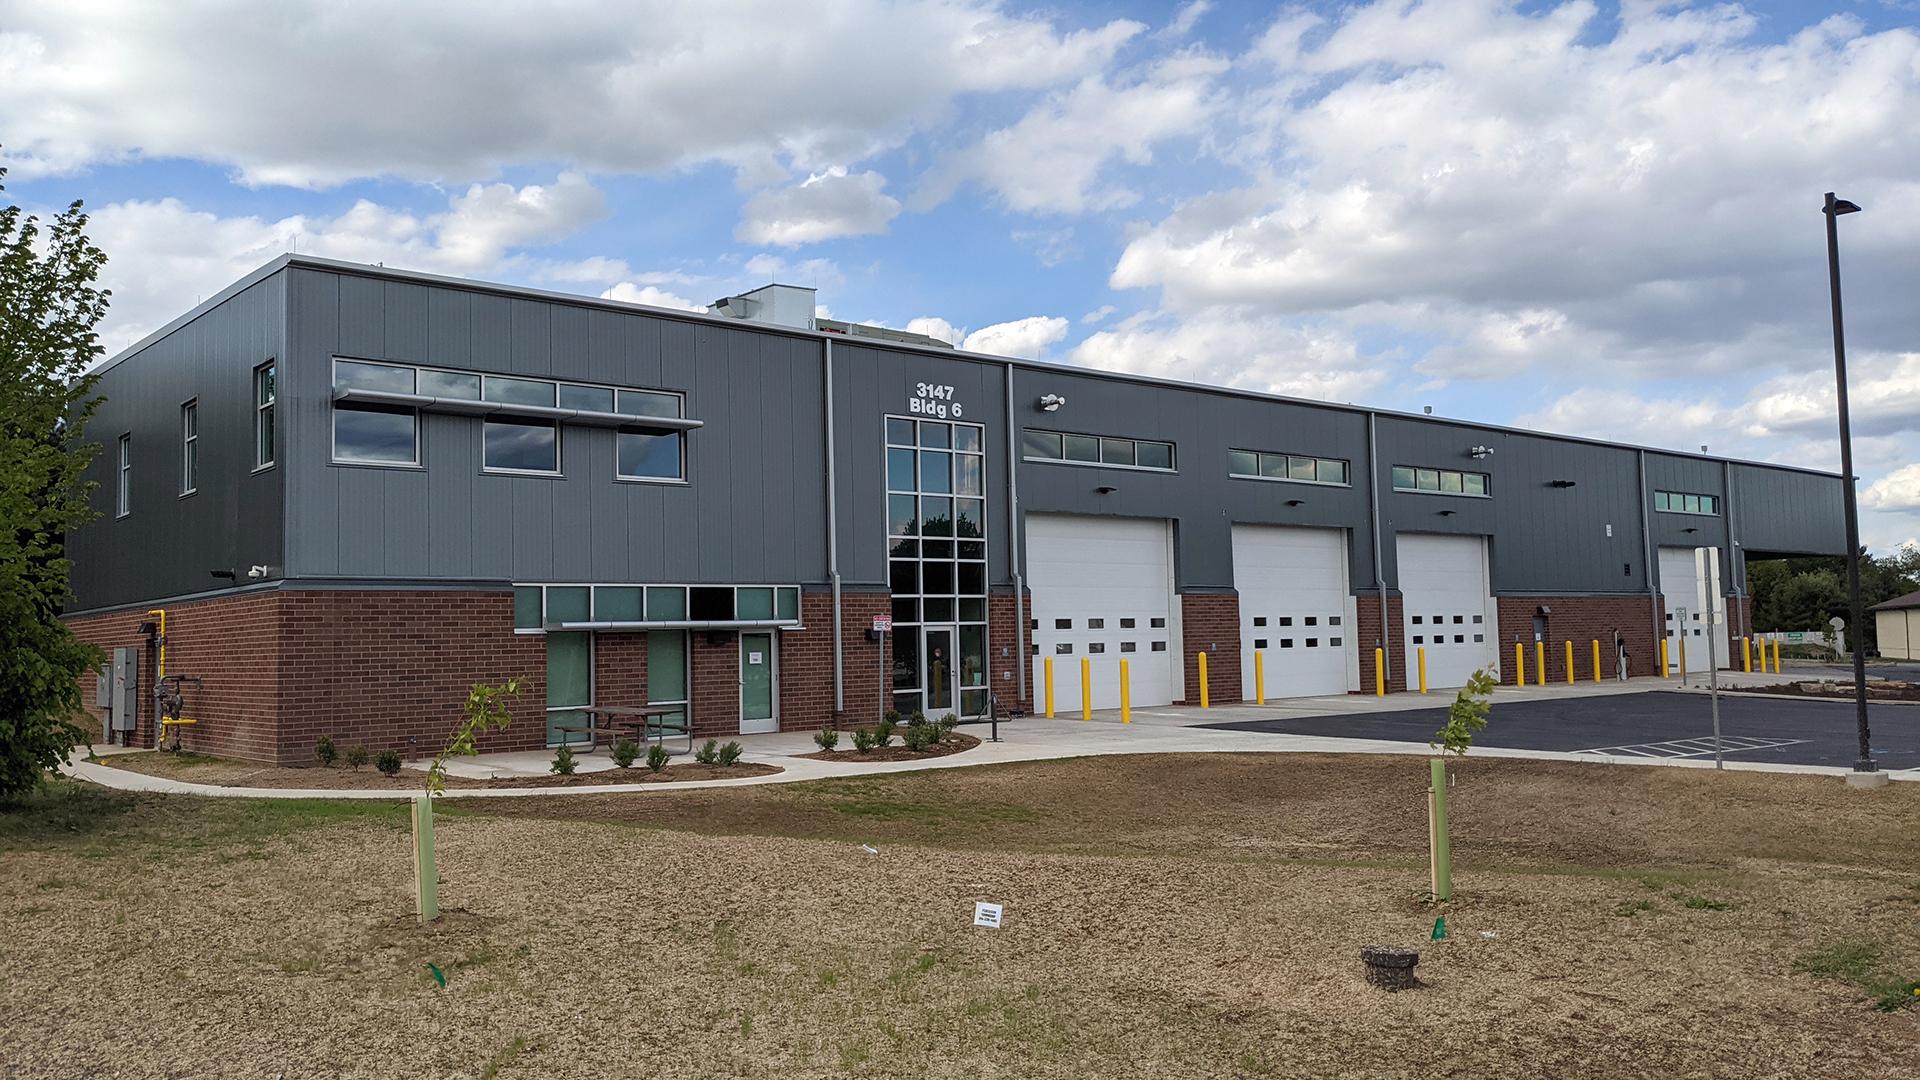 Ferguson Township Public Works Facility